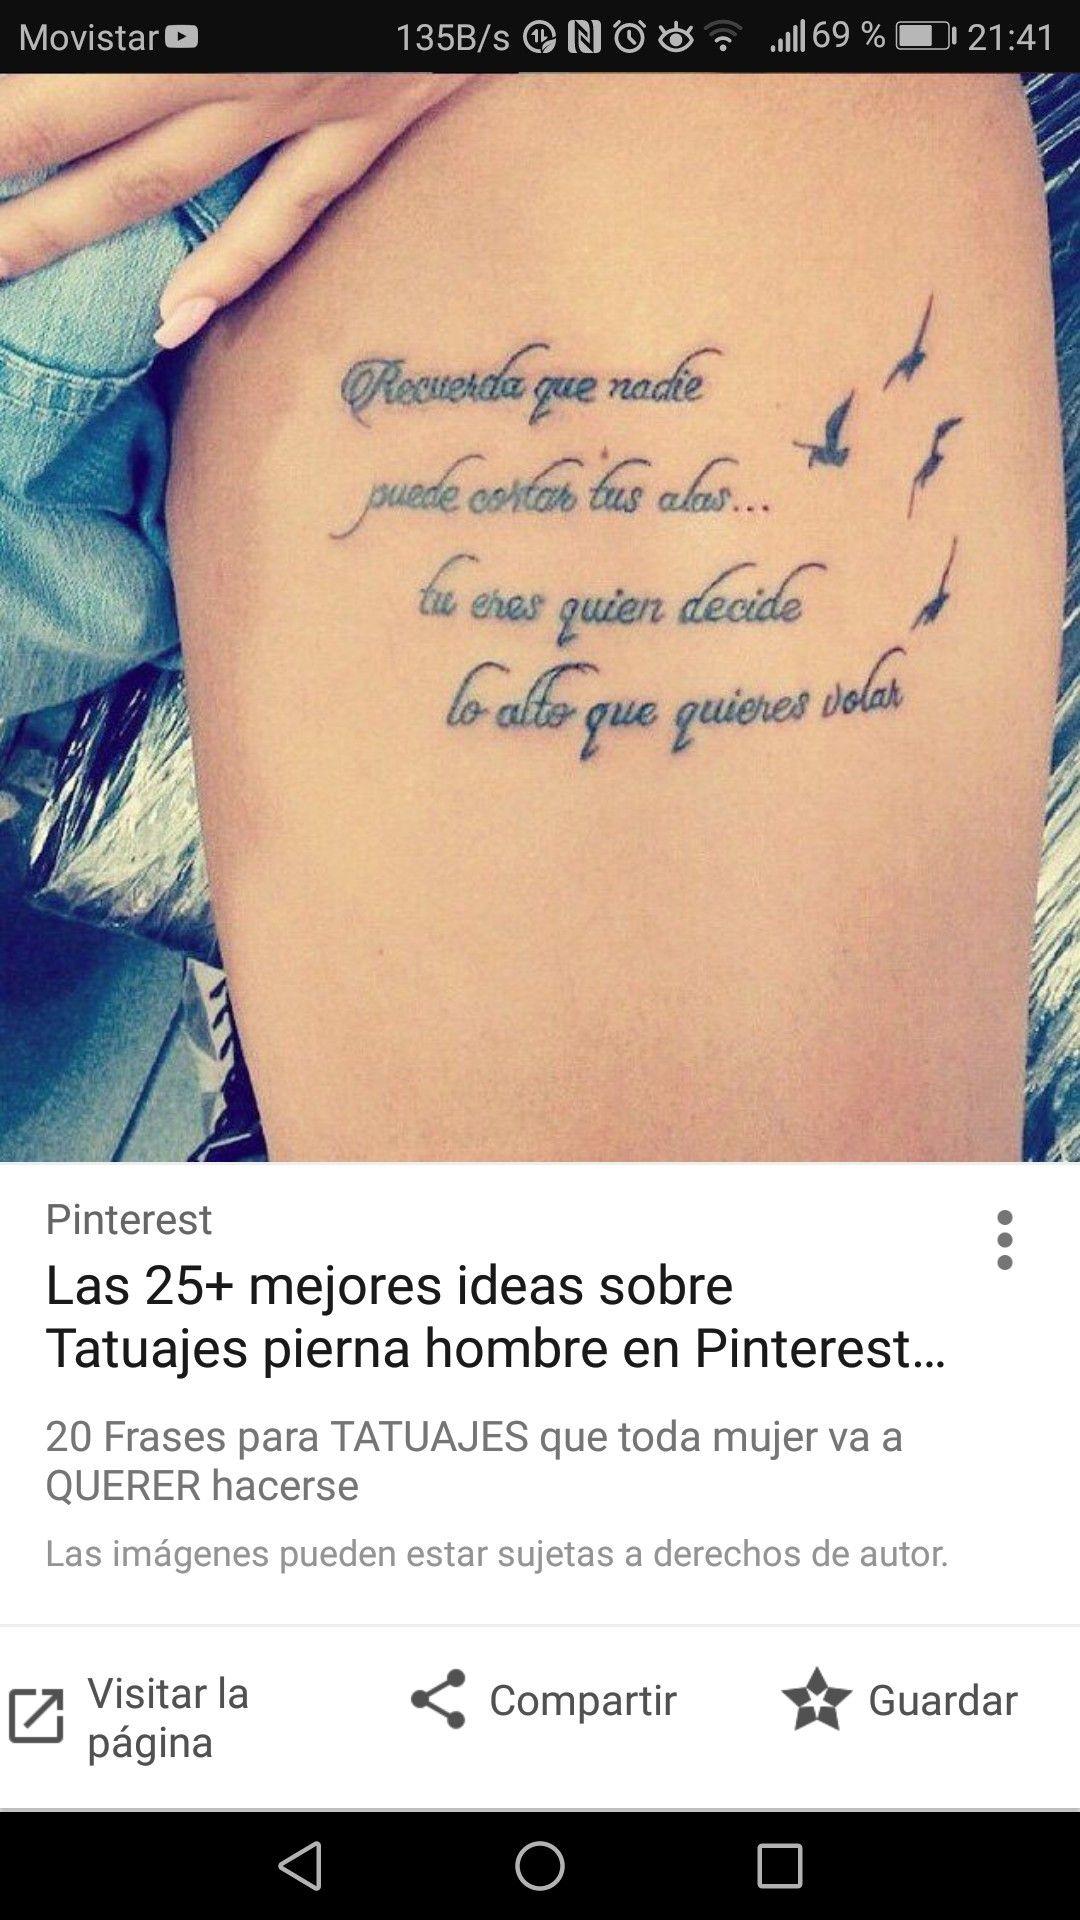 Pin De Esme Del Rio Gomez En Tatuajes Frases Para Tatuajes Tatuajes Tatuajes Pierna Hombre